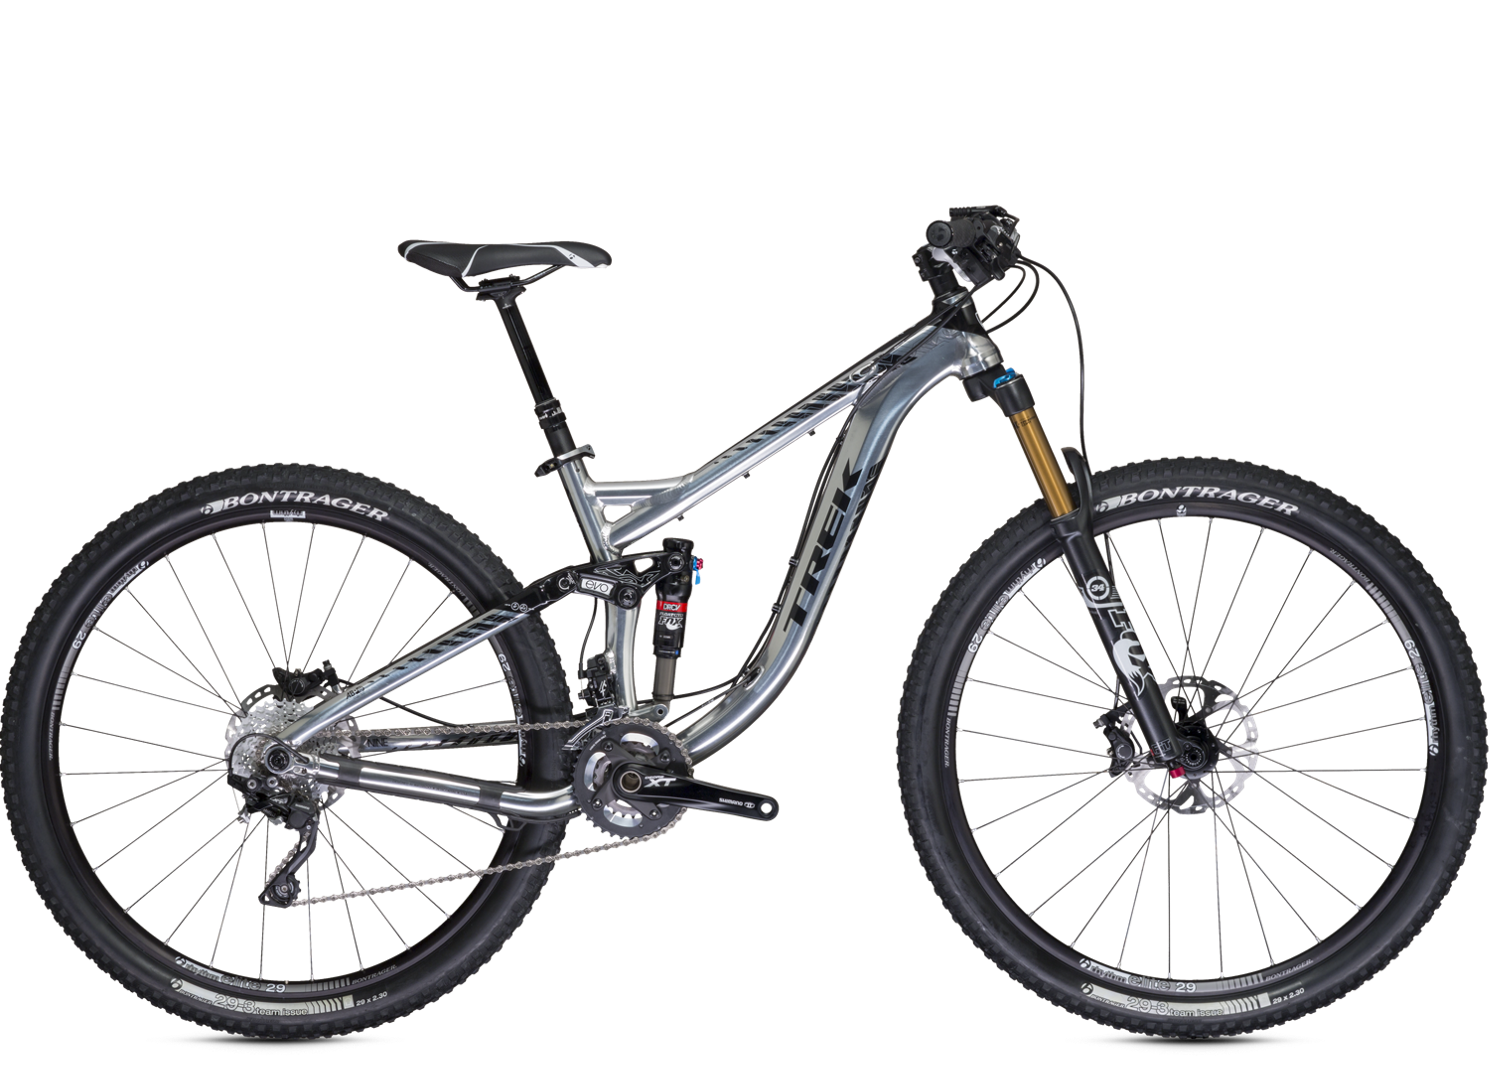 5be11f770fa 2014 Remedy 9 29 - Bike Archive - Trek Bicycle